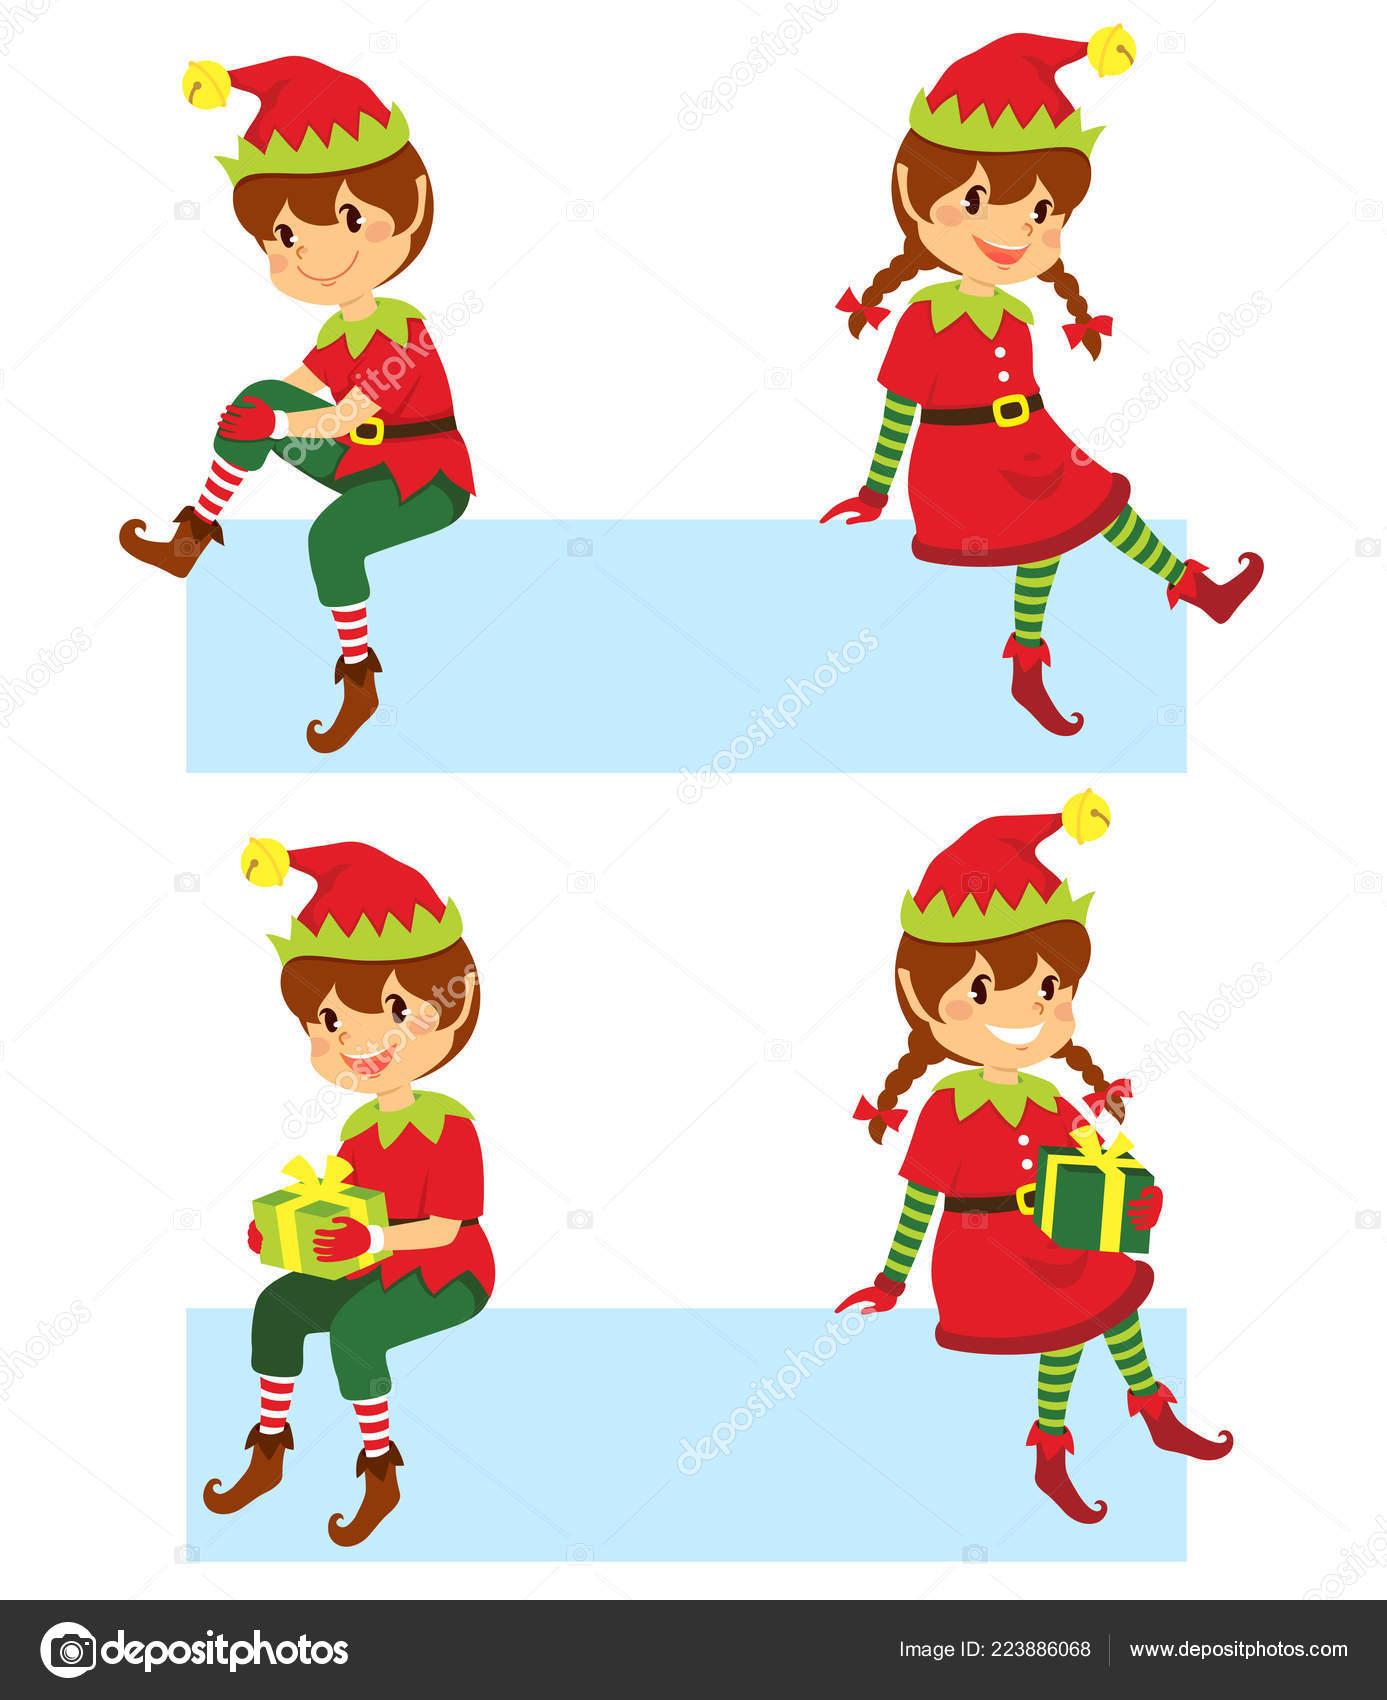 Cute Cartoon Christmas Elves Sitting Banner Different